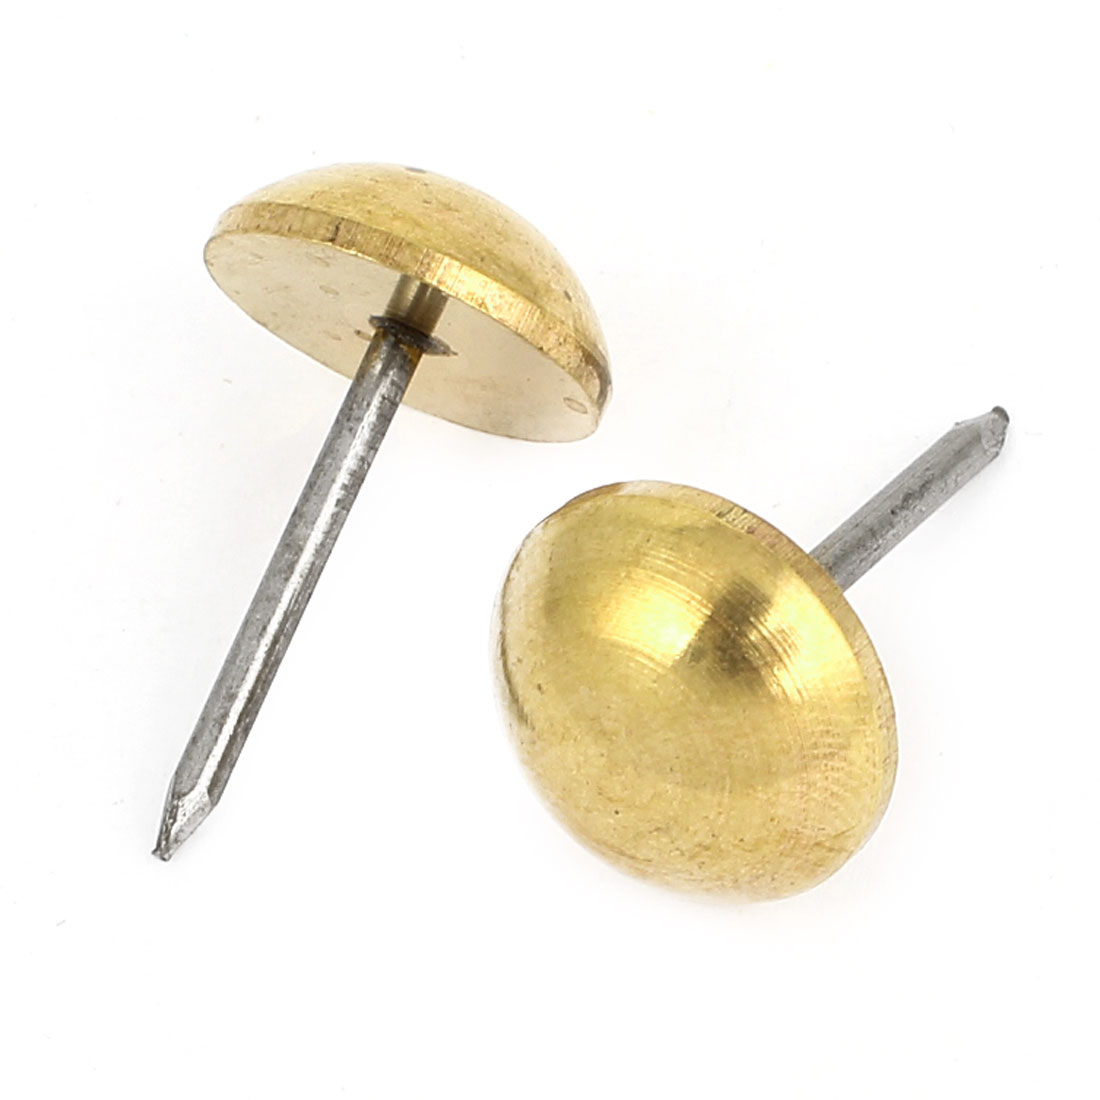 2 Pcs Gold Tone Office Message Board Pushpins Thumb Tacks 20mm Dia